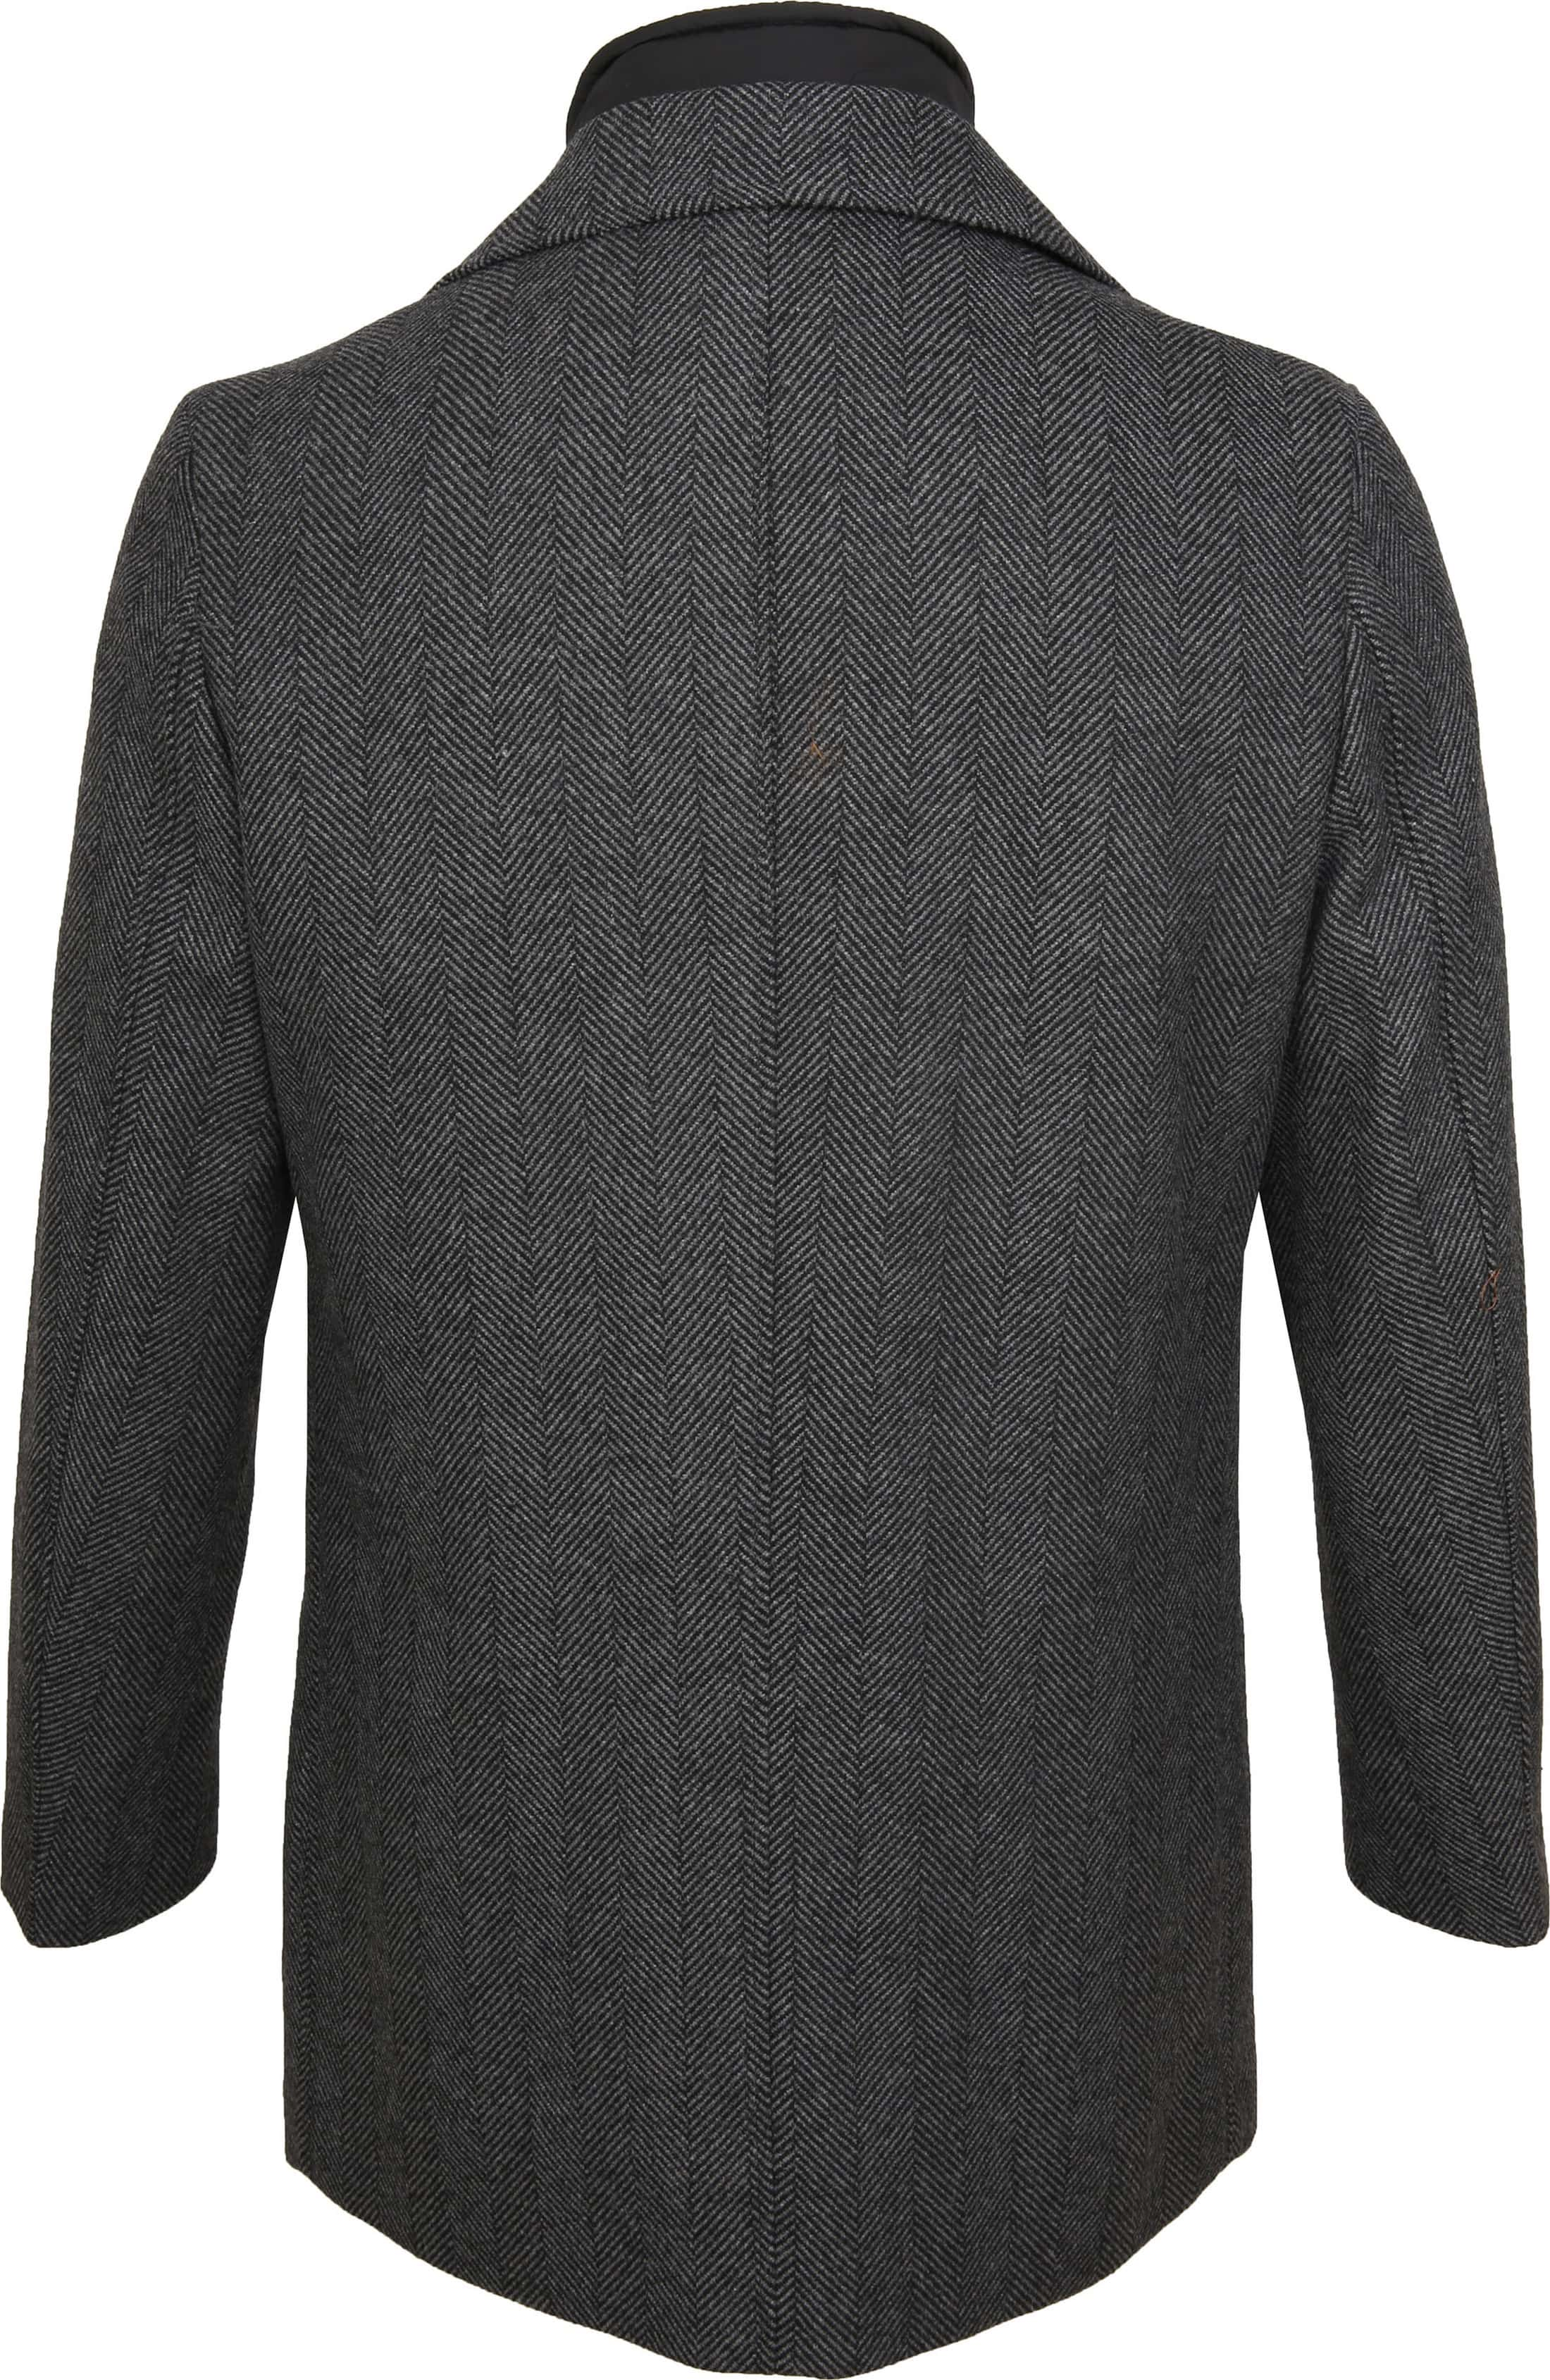 Suitable Geke Coat Herringbone Antraciet foto 6